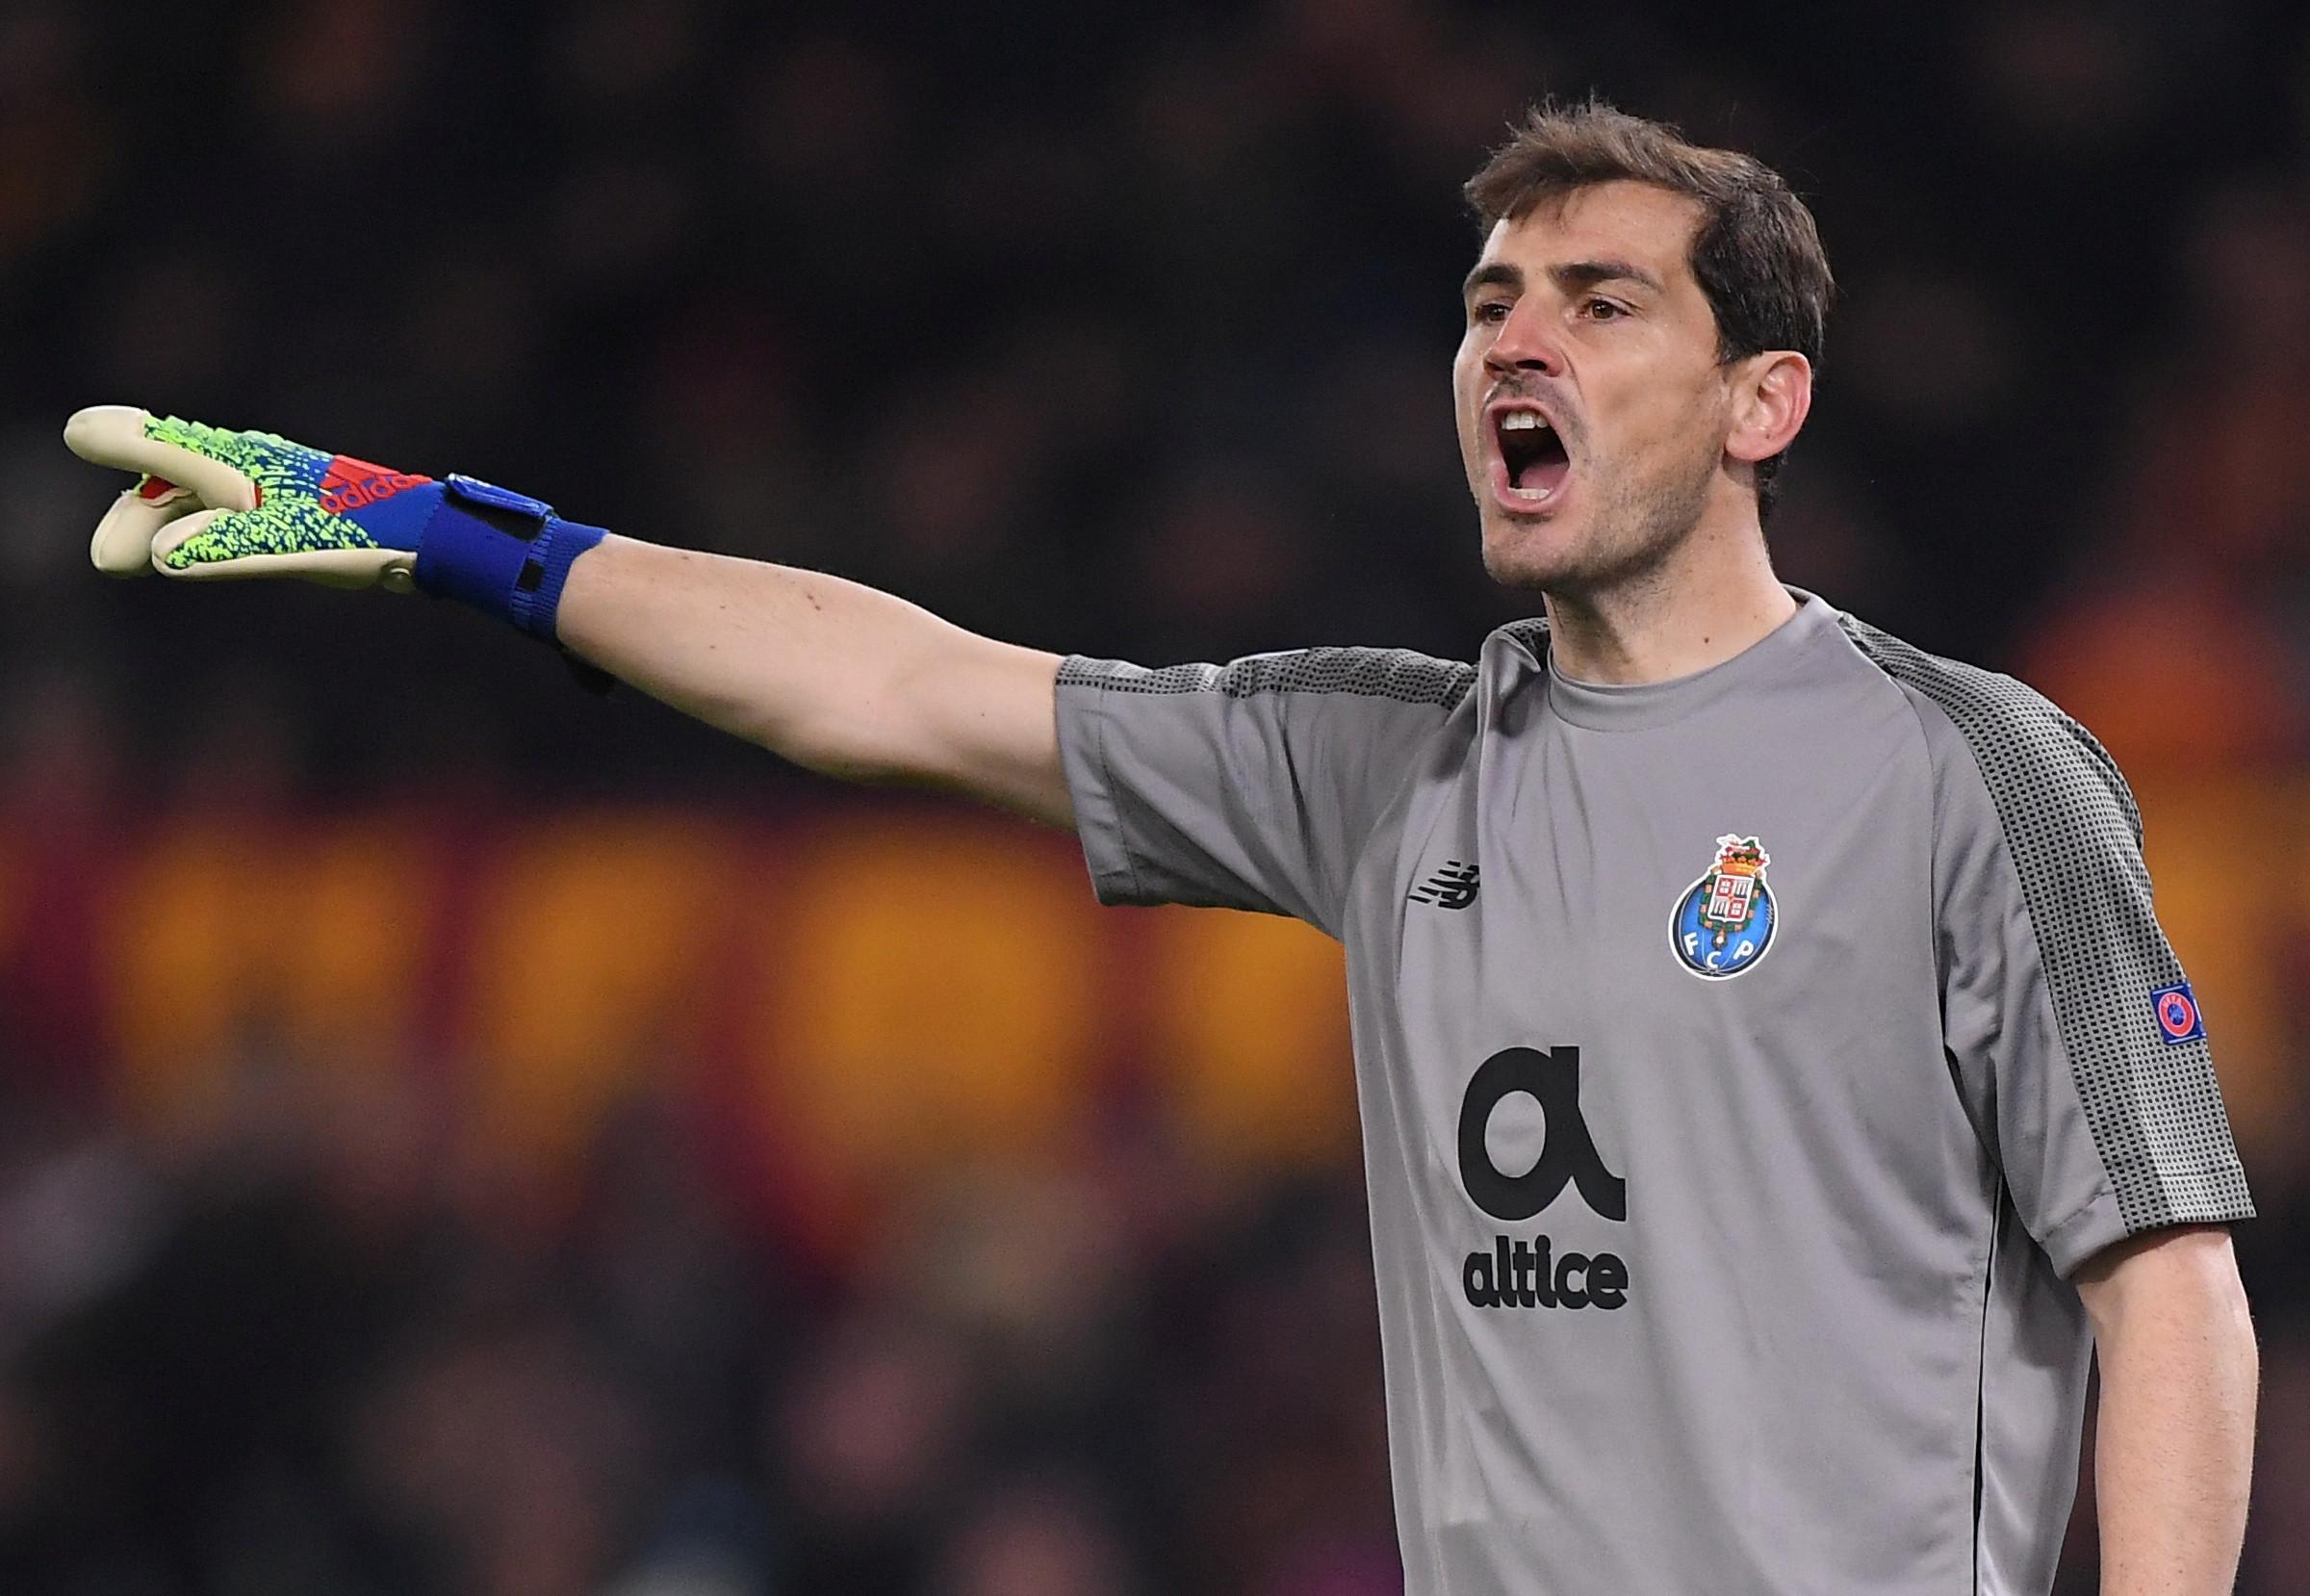 Oficial: Casillas renova contrato com o FC Porto